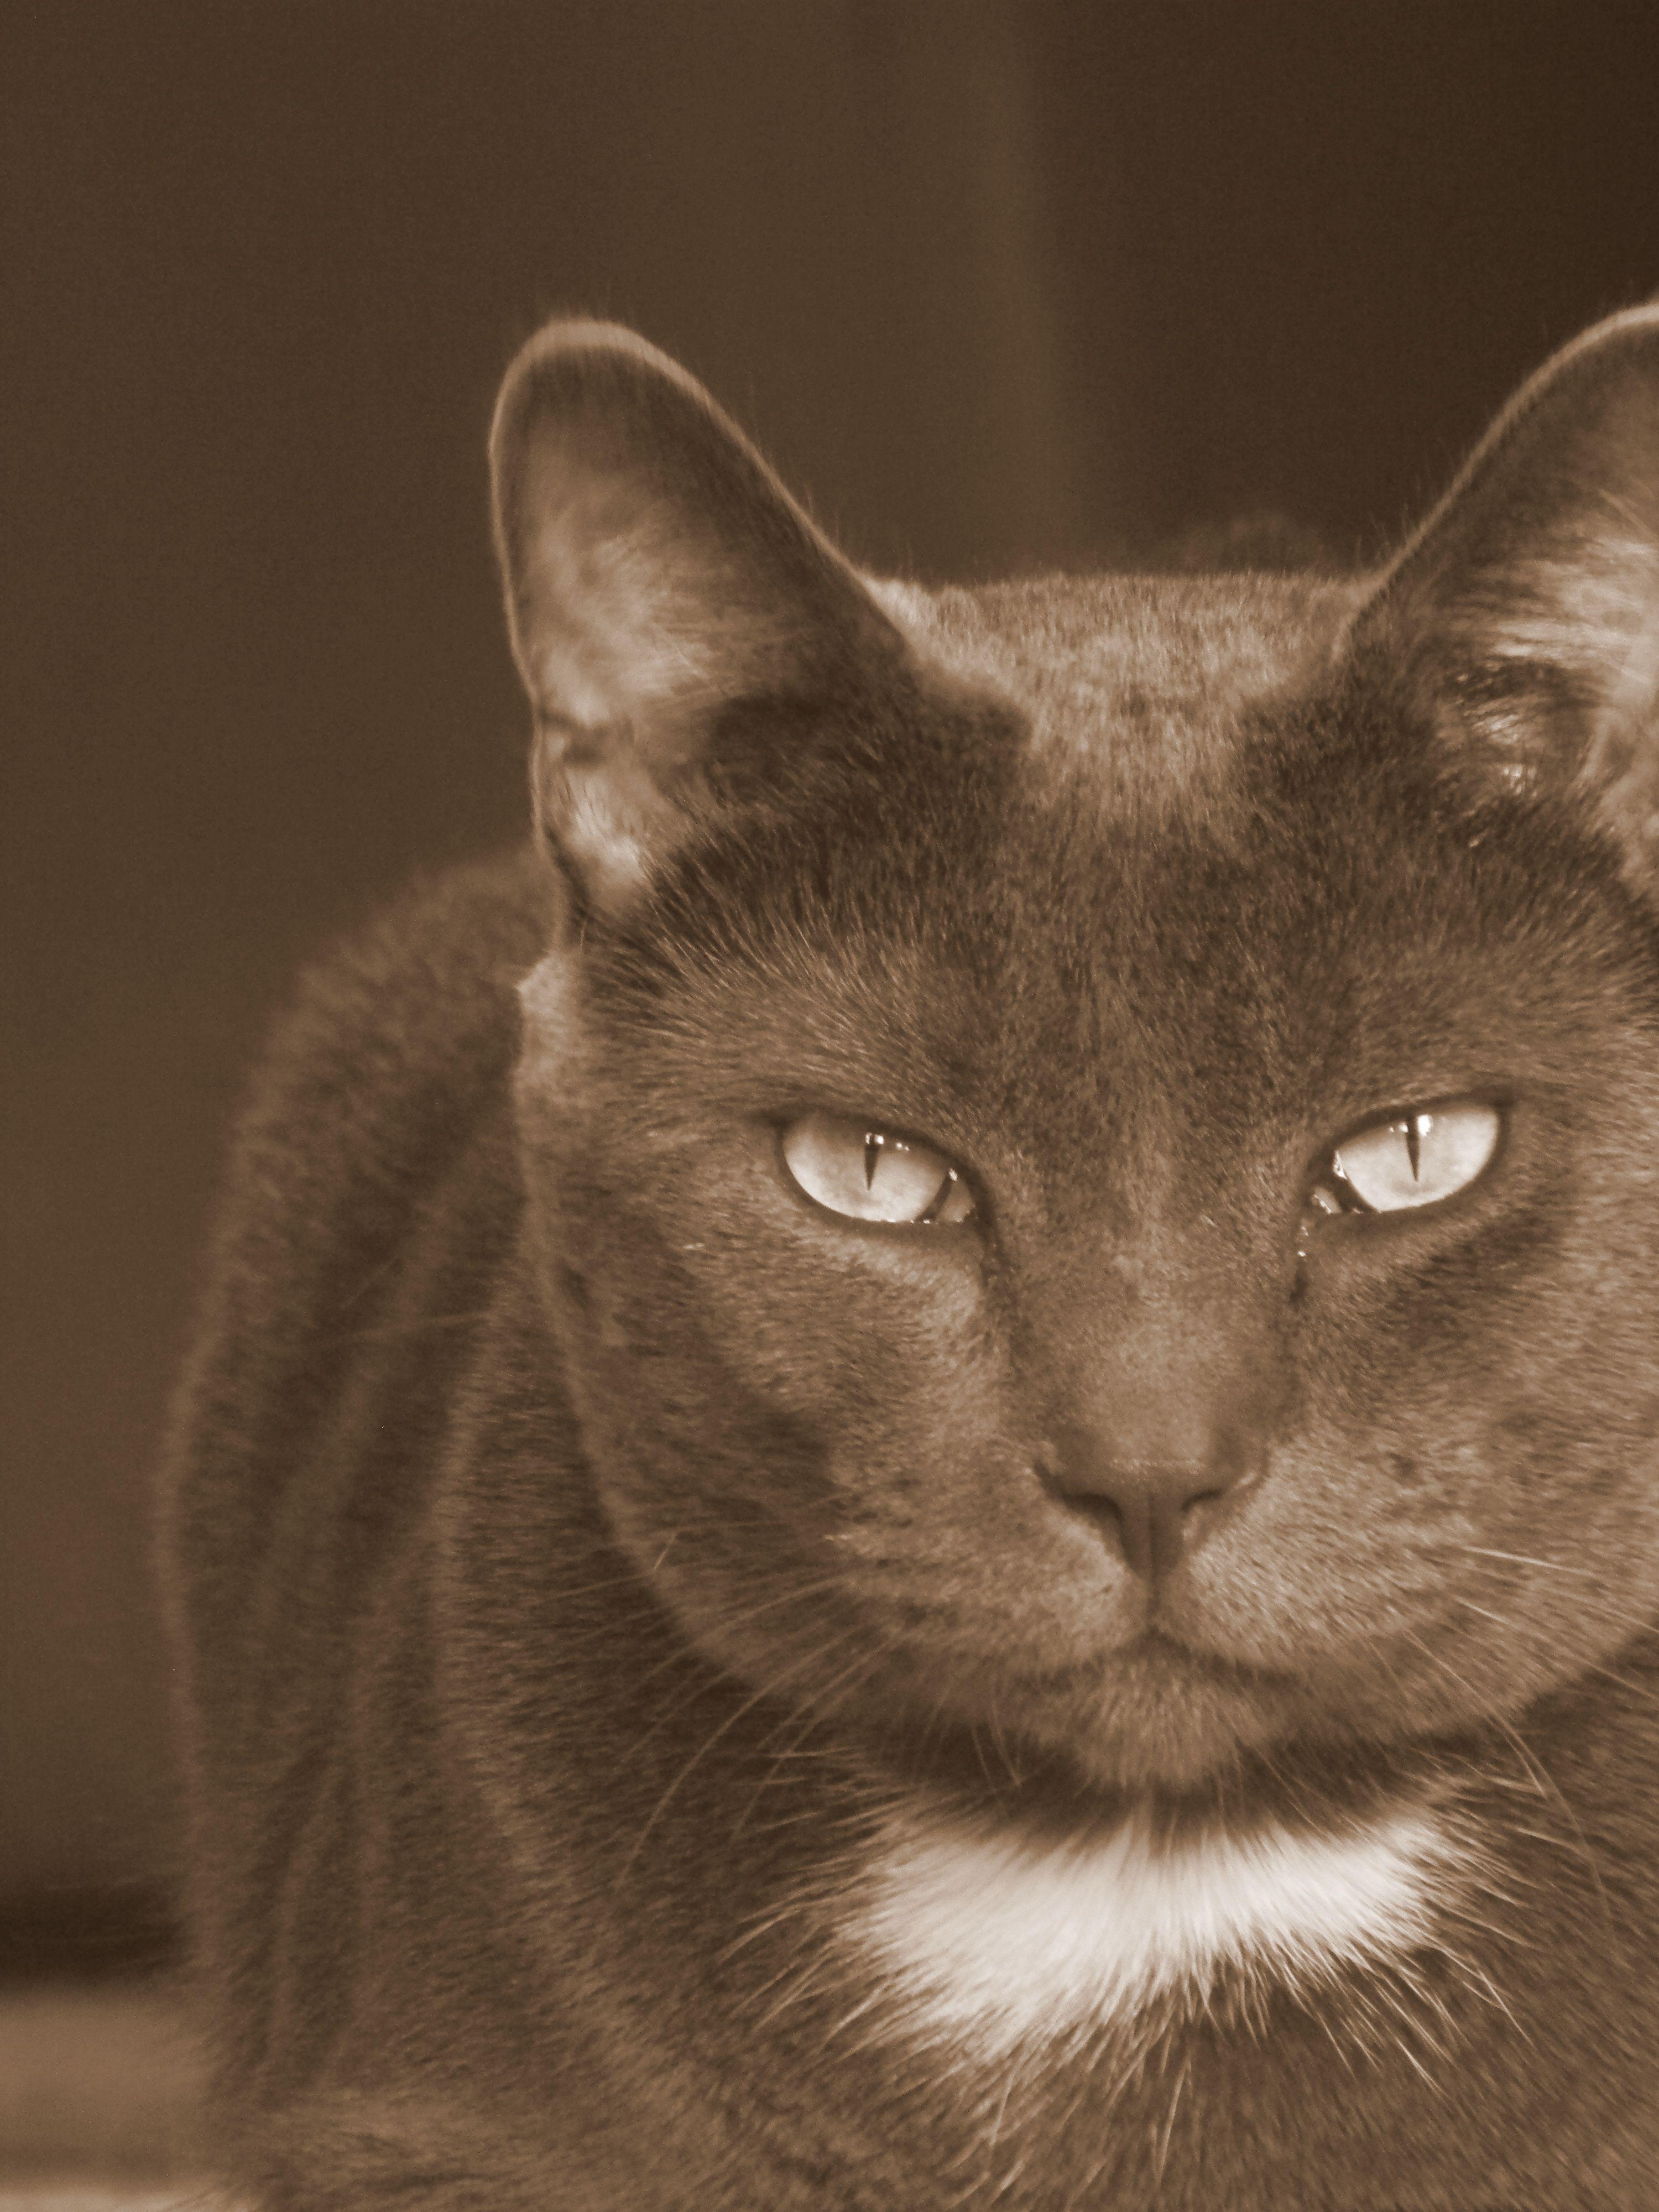 Cat Photography, fierce but lovely